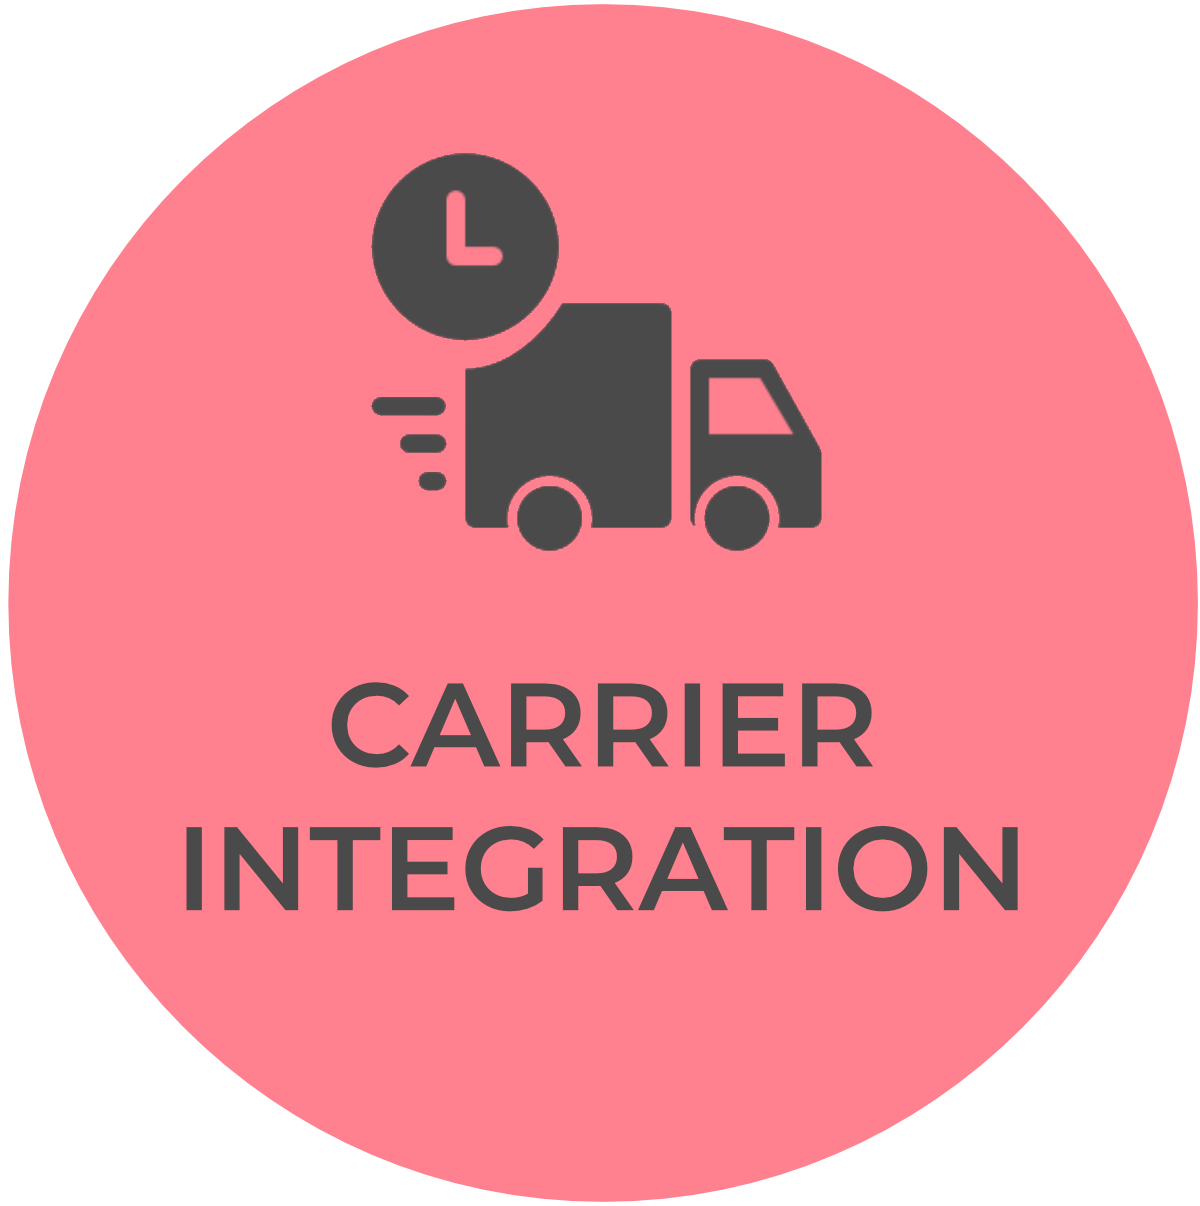 carrier integration